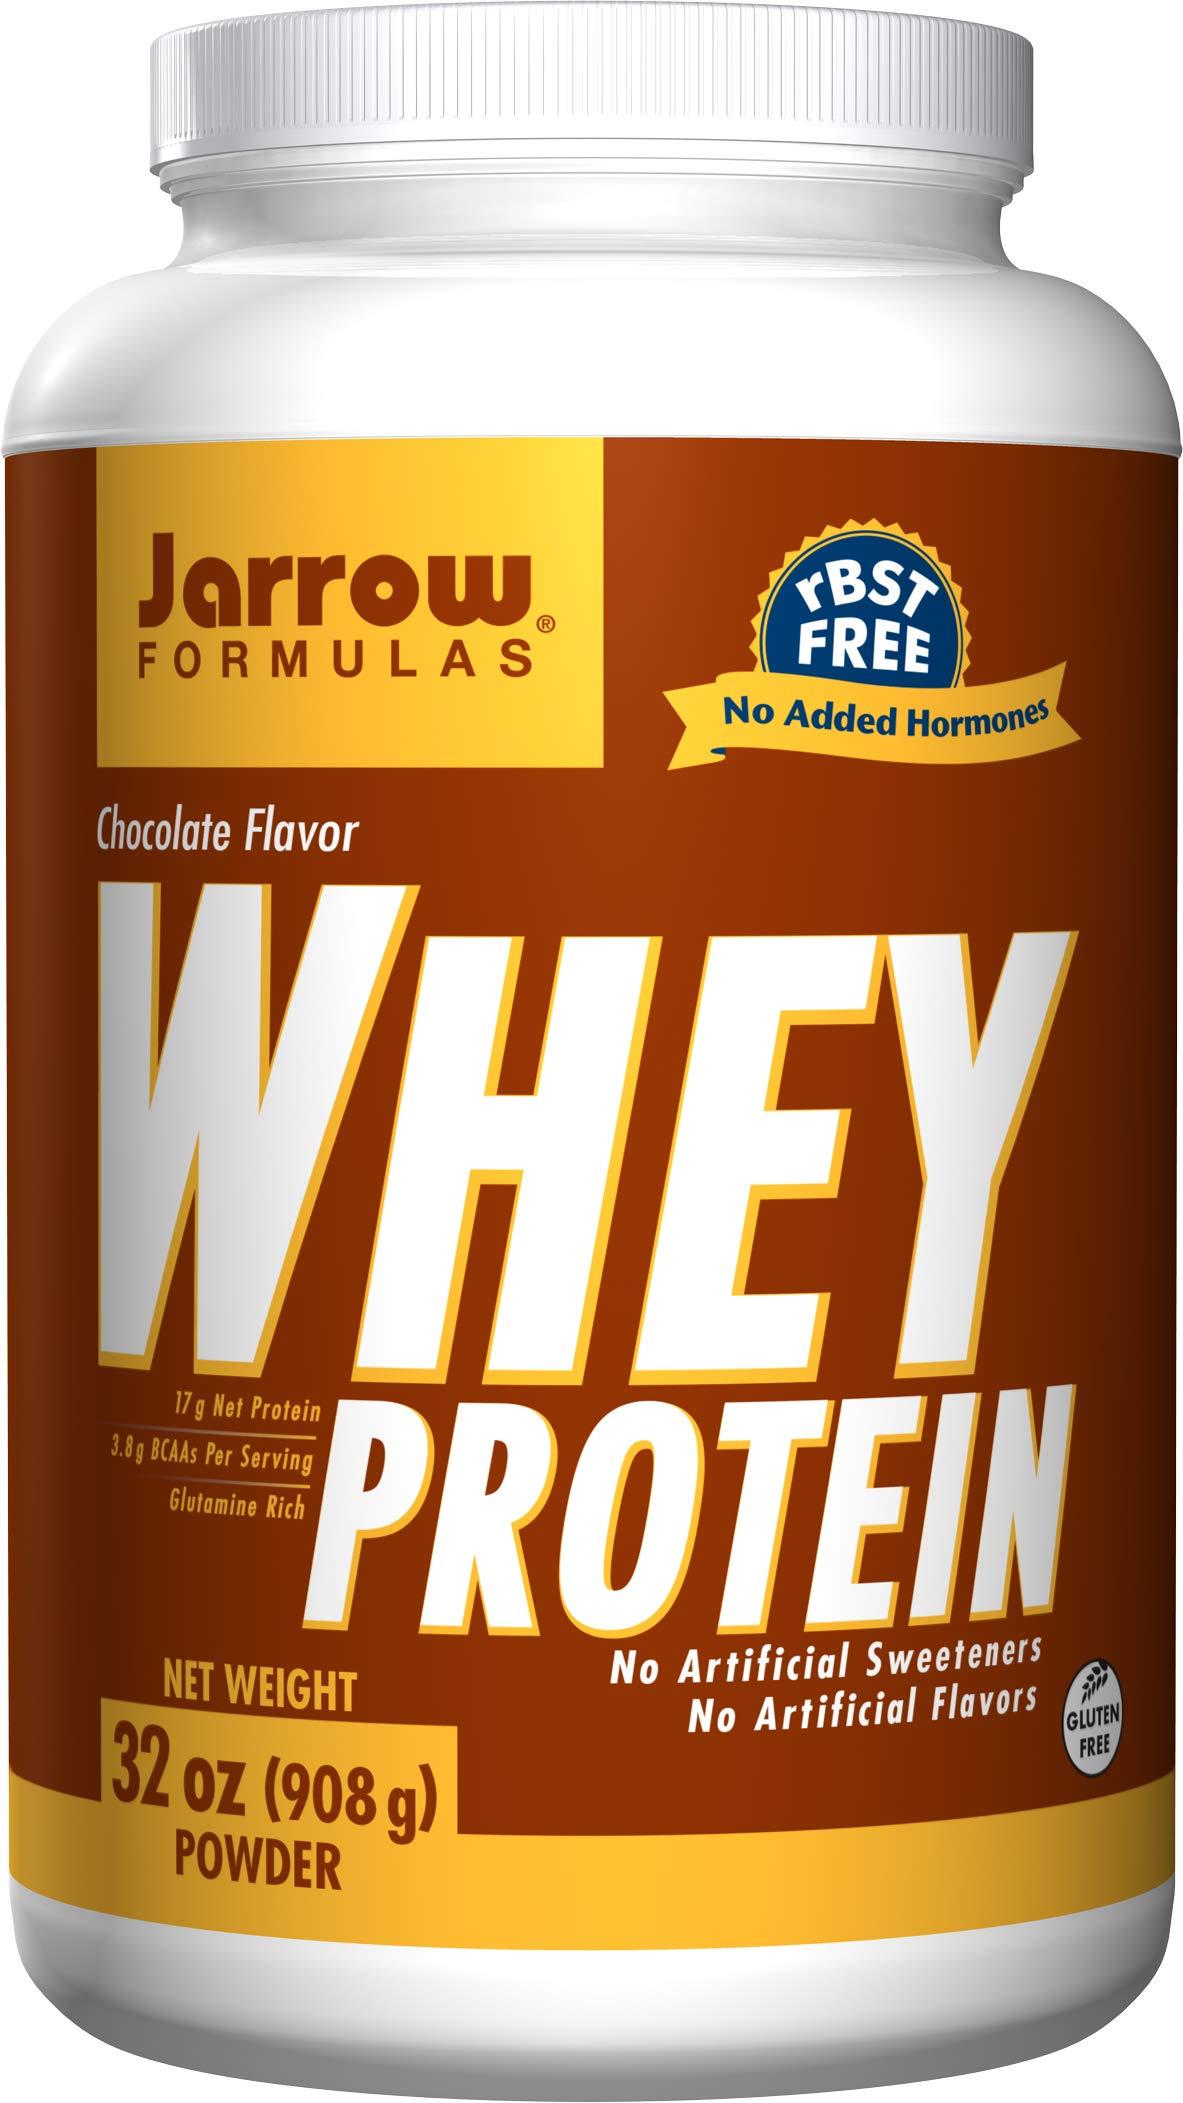 Jarrow Formulas Whey Protein, Supports Muscle Development, Chocolate, 32 Oz by Jarrow Formulas